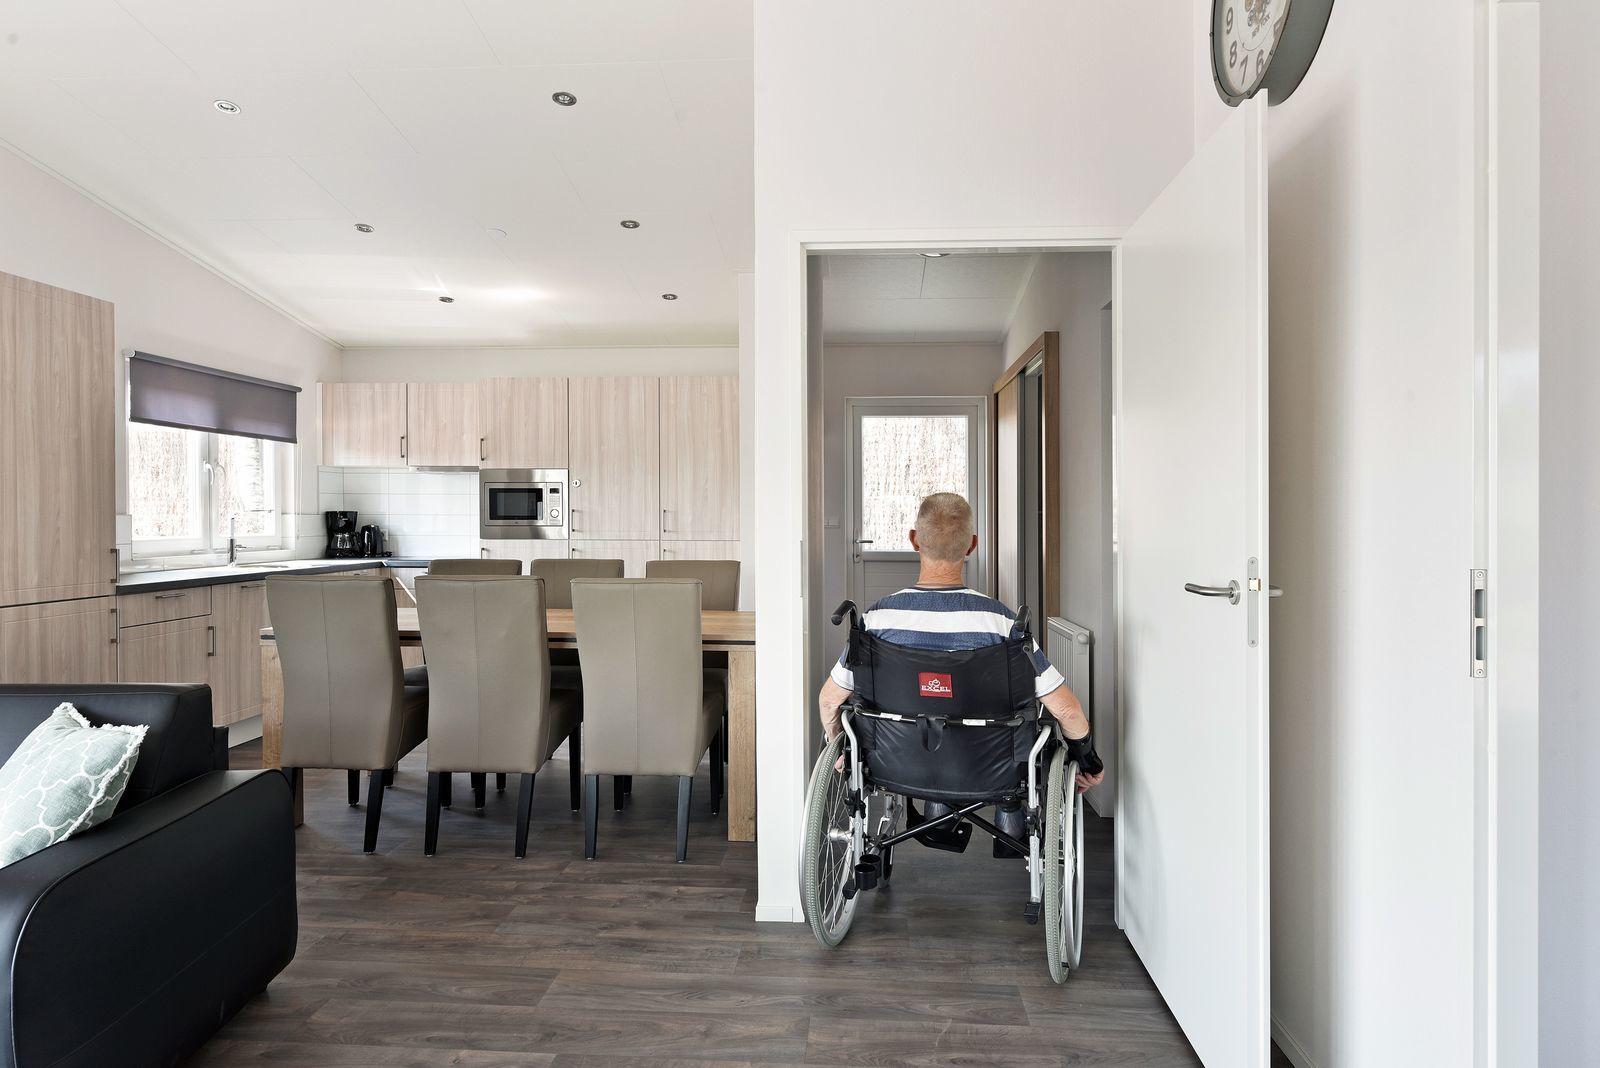 MiVa /Care Chalet: 4-6 Personen, 2 Schlafzimmer